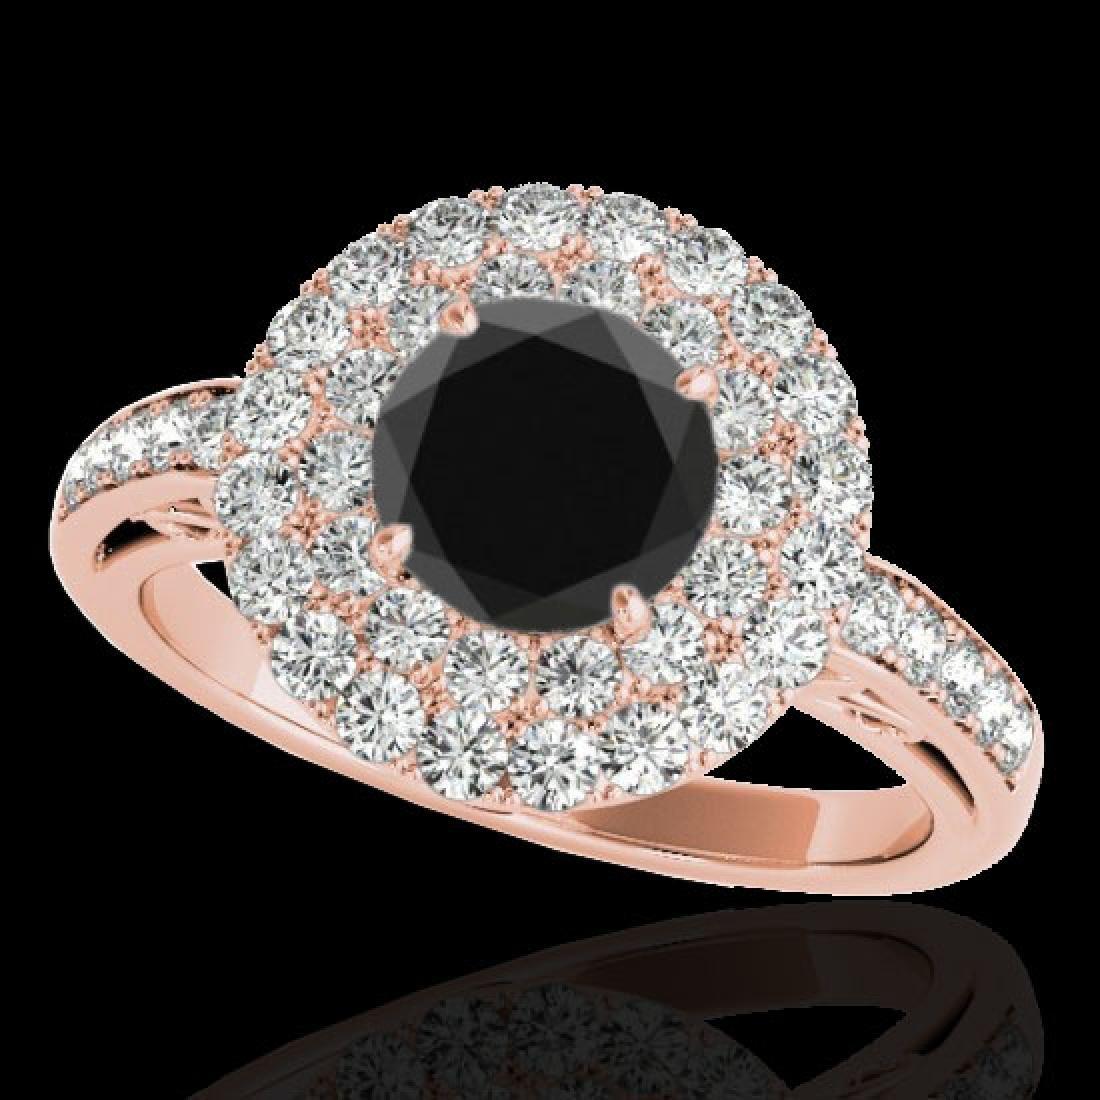 2.25 CTW Certified VS Black Diamond Solitaire Halo Ring